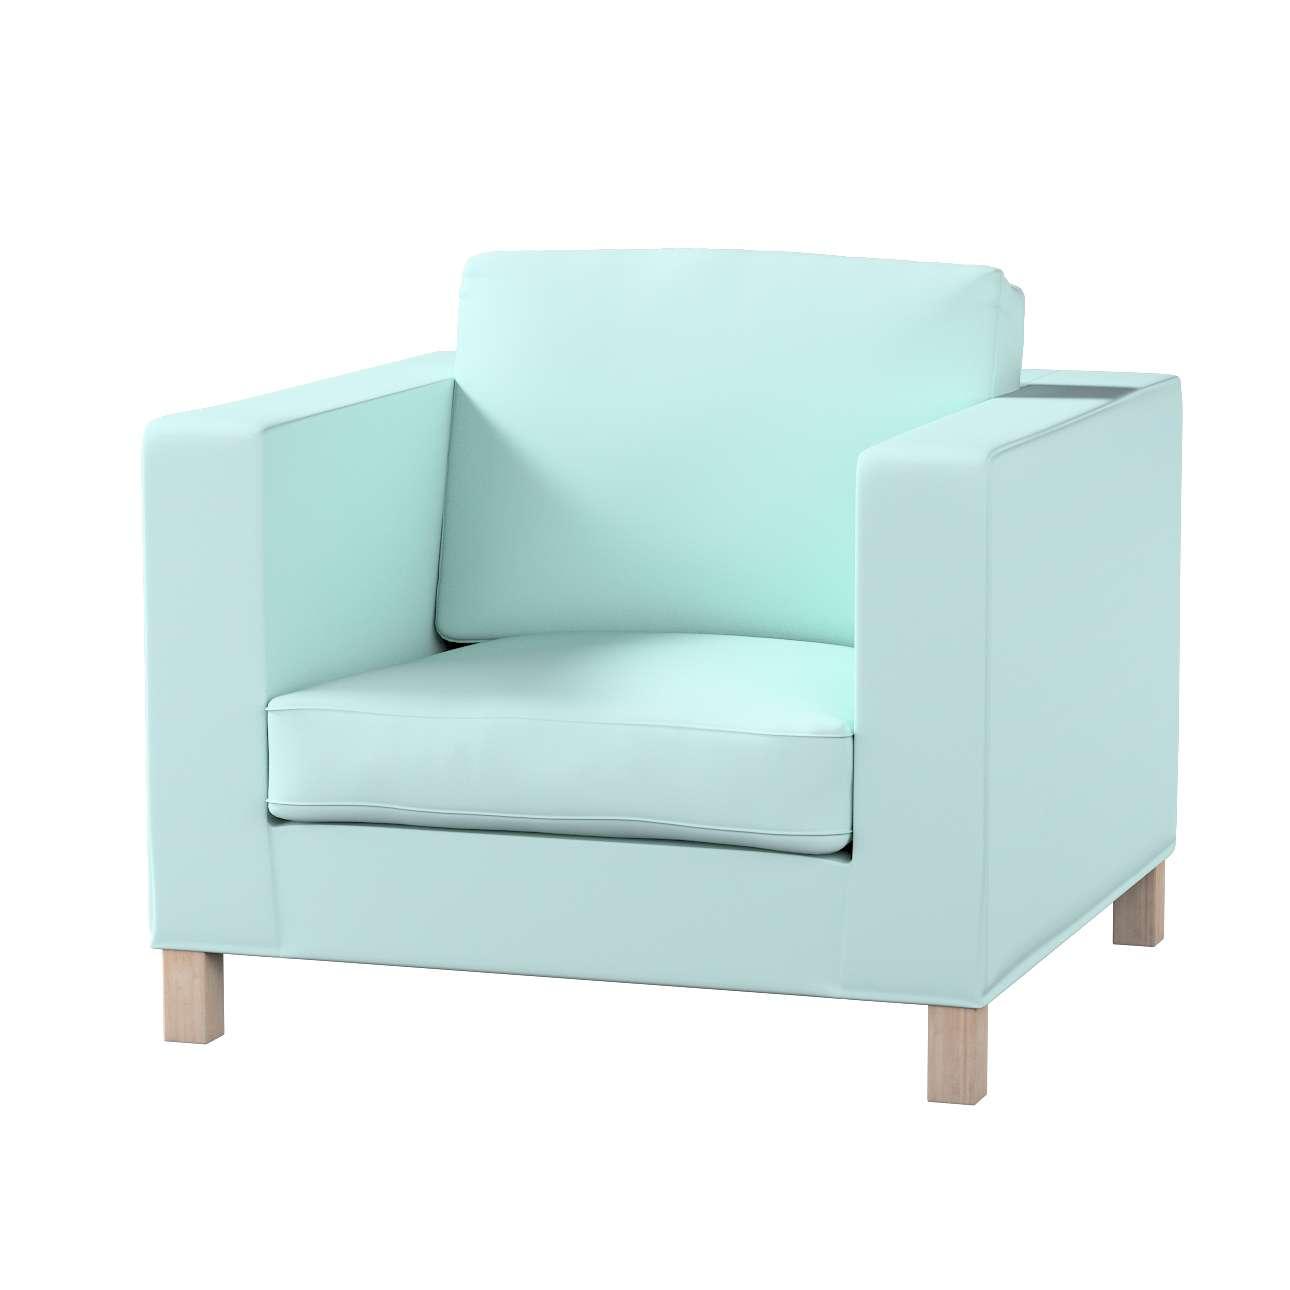 Karlanda fotelhuzat rövid a kollekcióból Cotton Panama Bútorszövet, Dekoranyag: 702-10